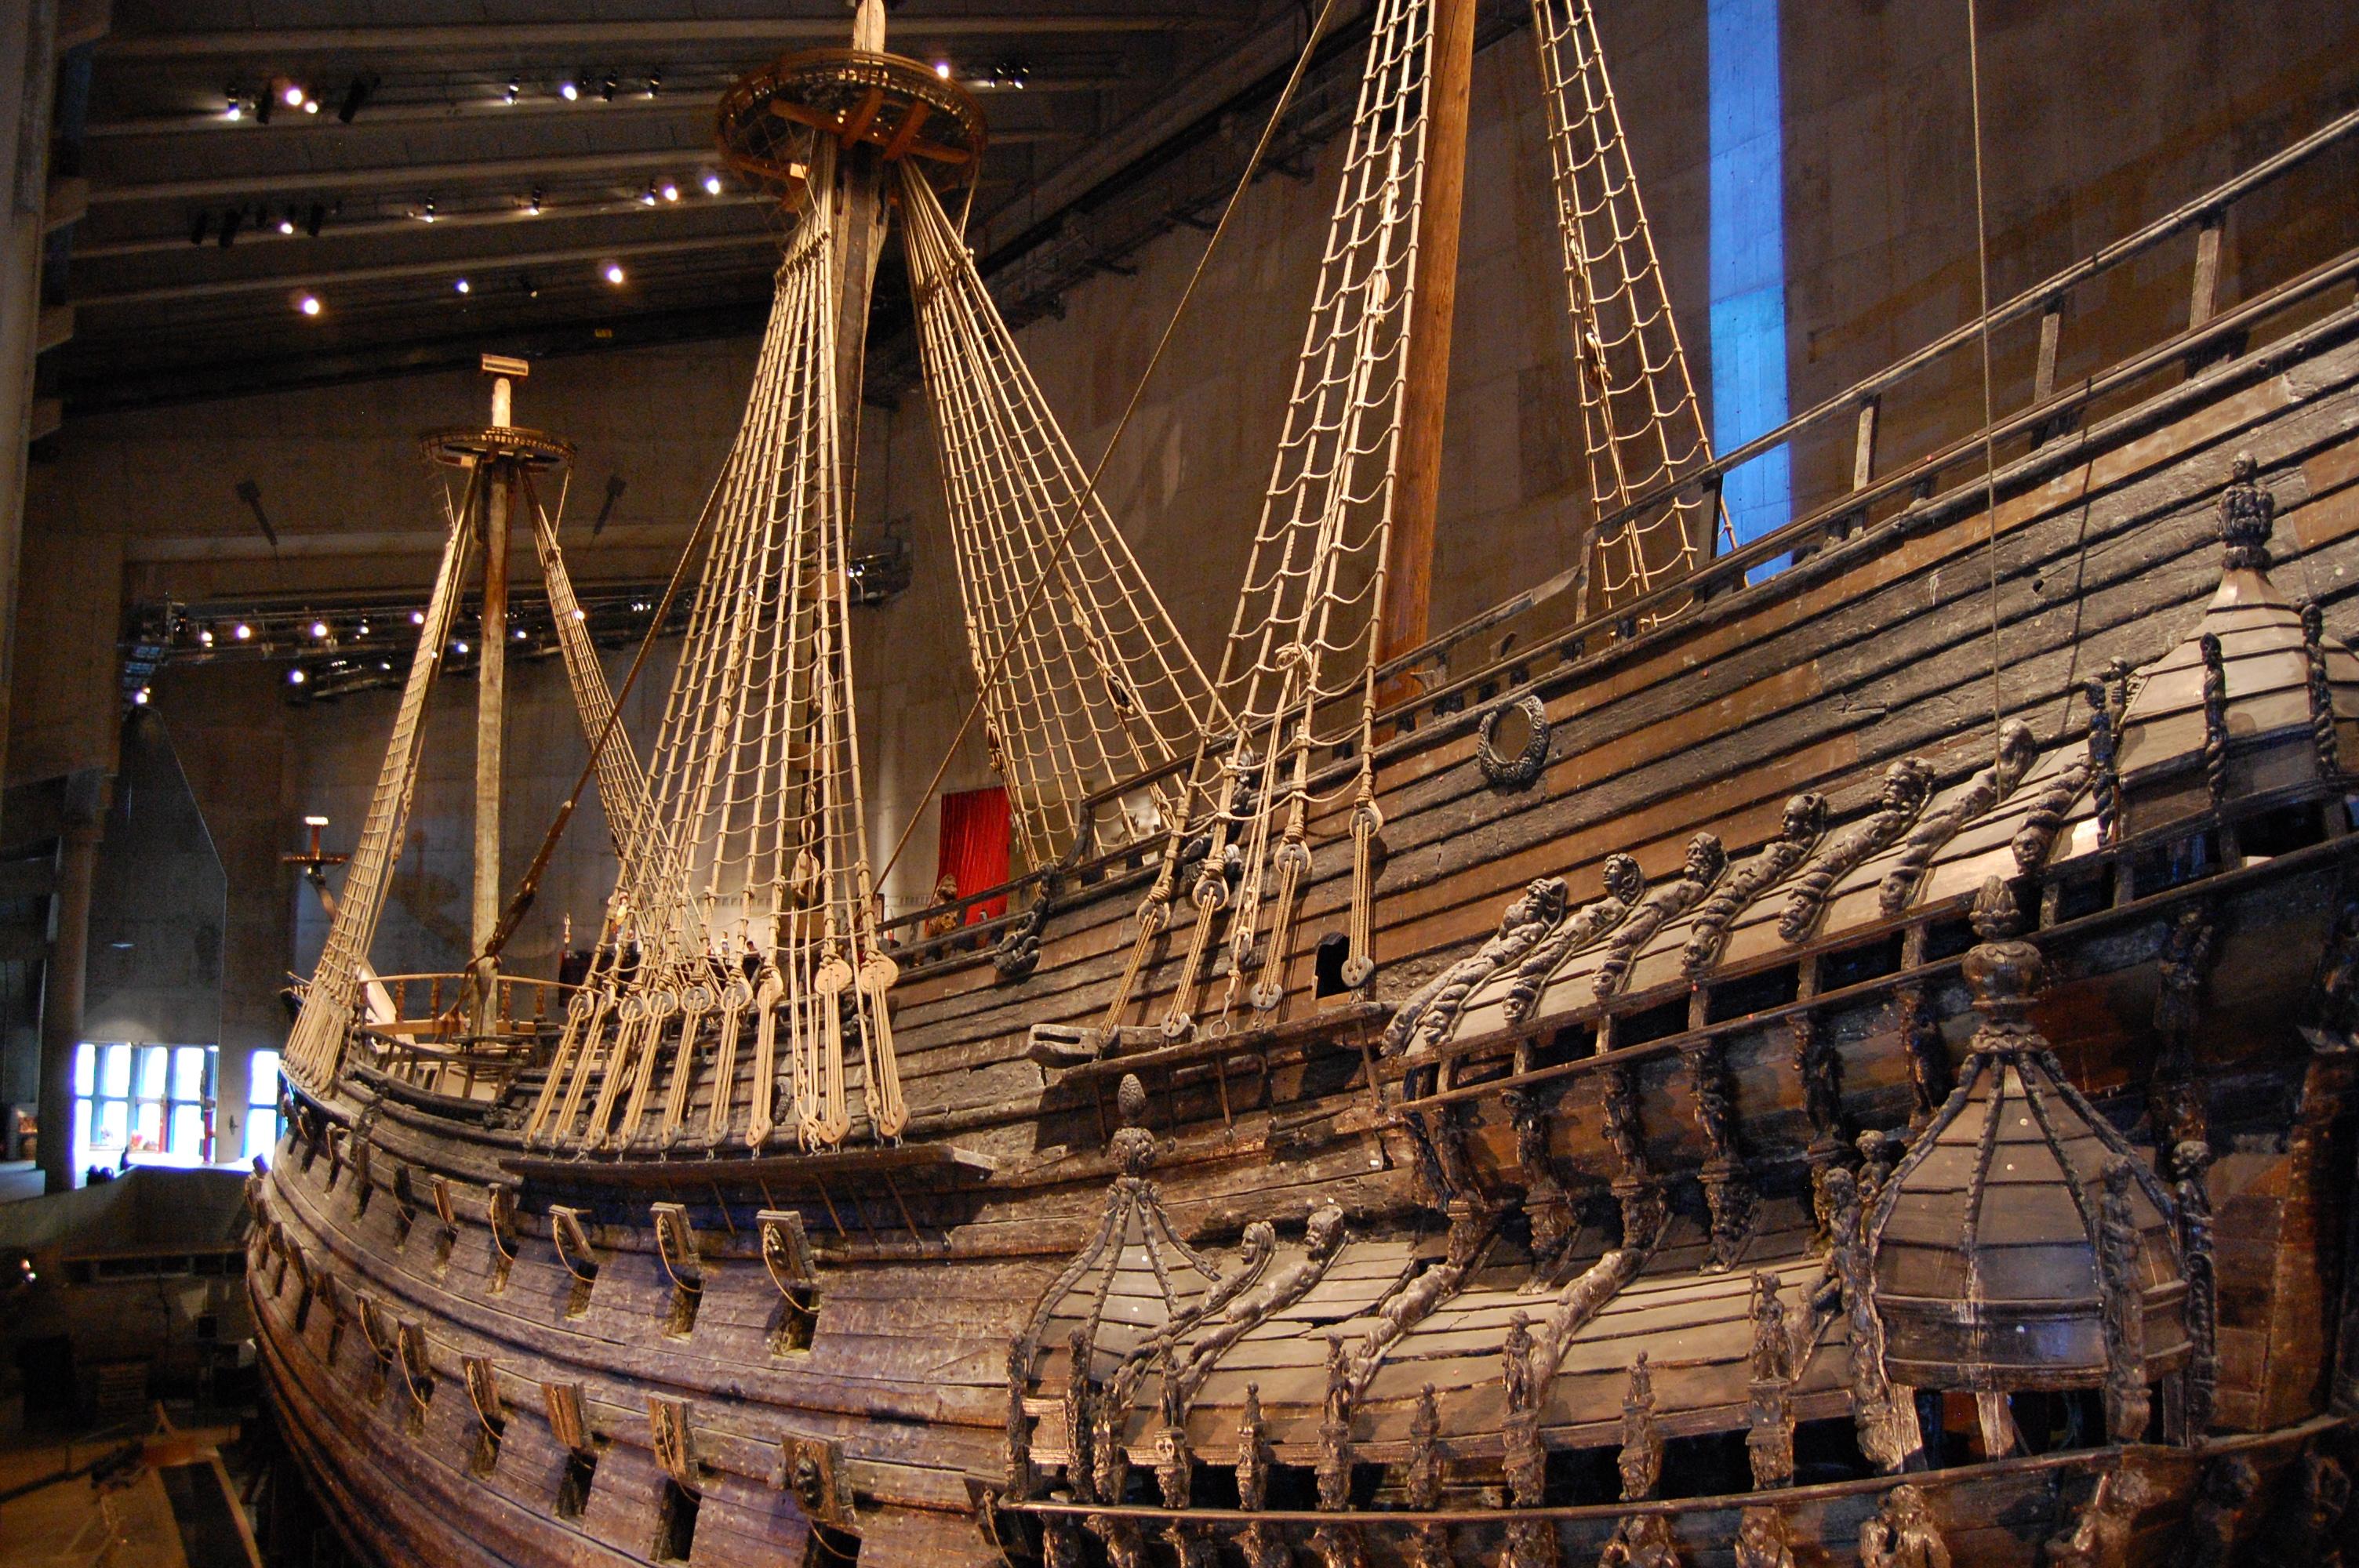 stockholm_vasamuseum_ship4